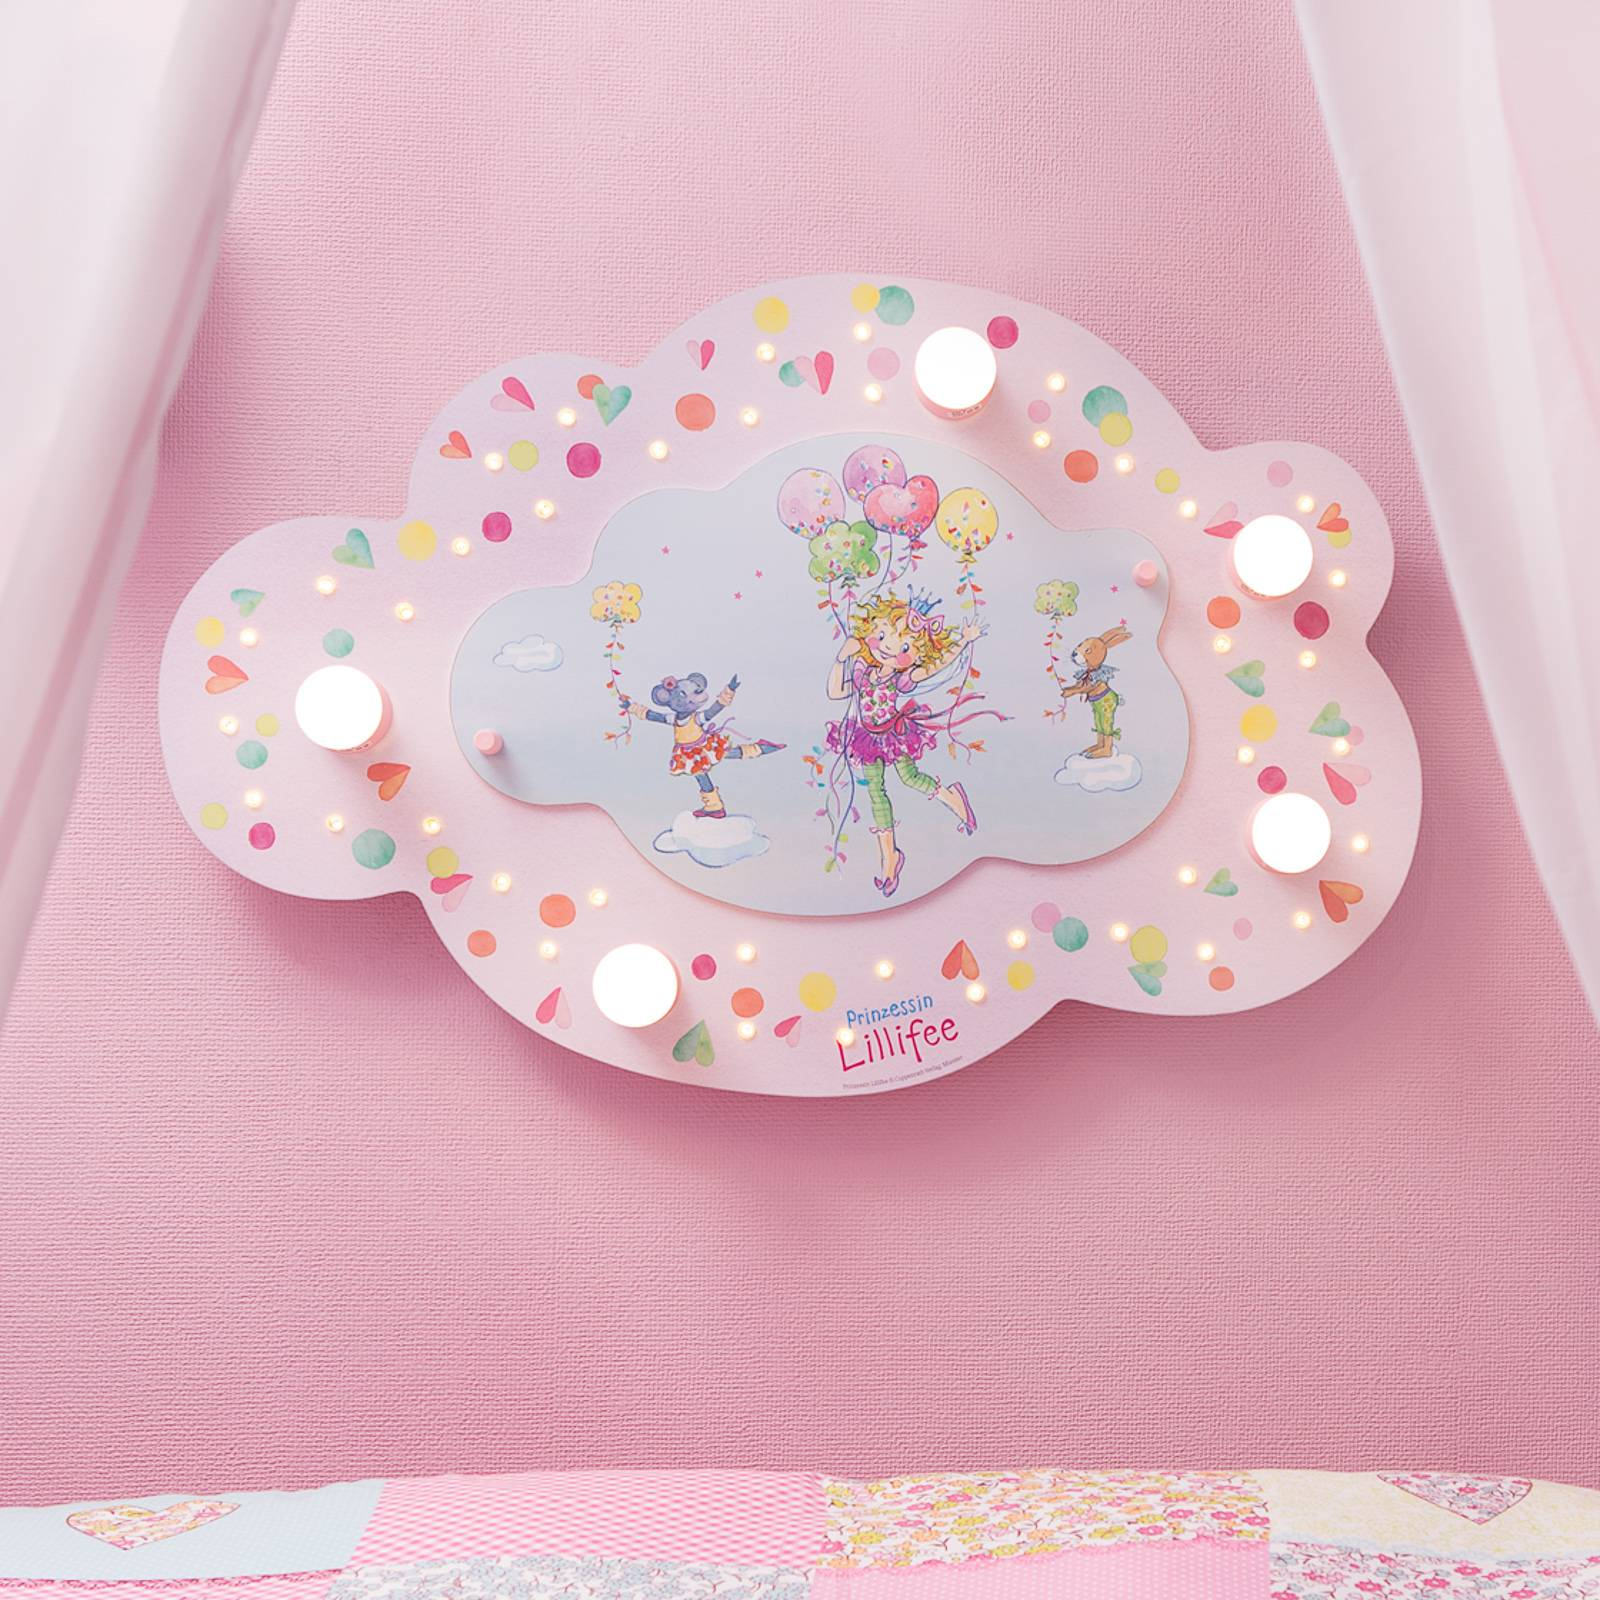 Prinsessa Lillifee LED-kattovalaisin, pilvi